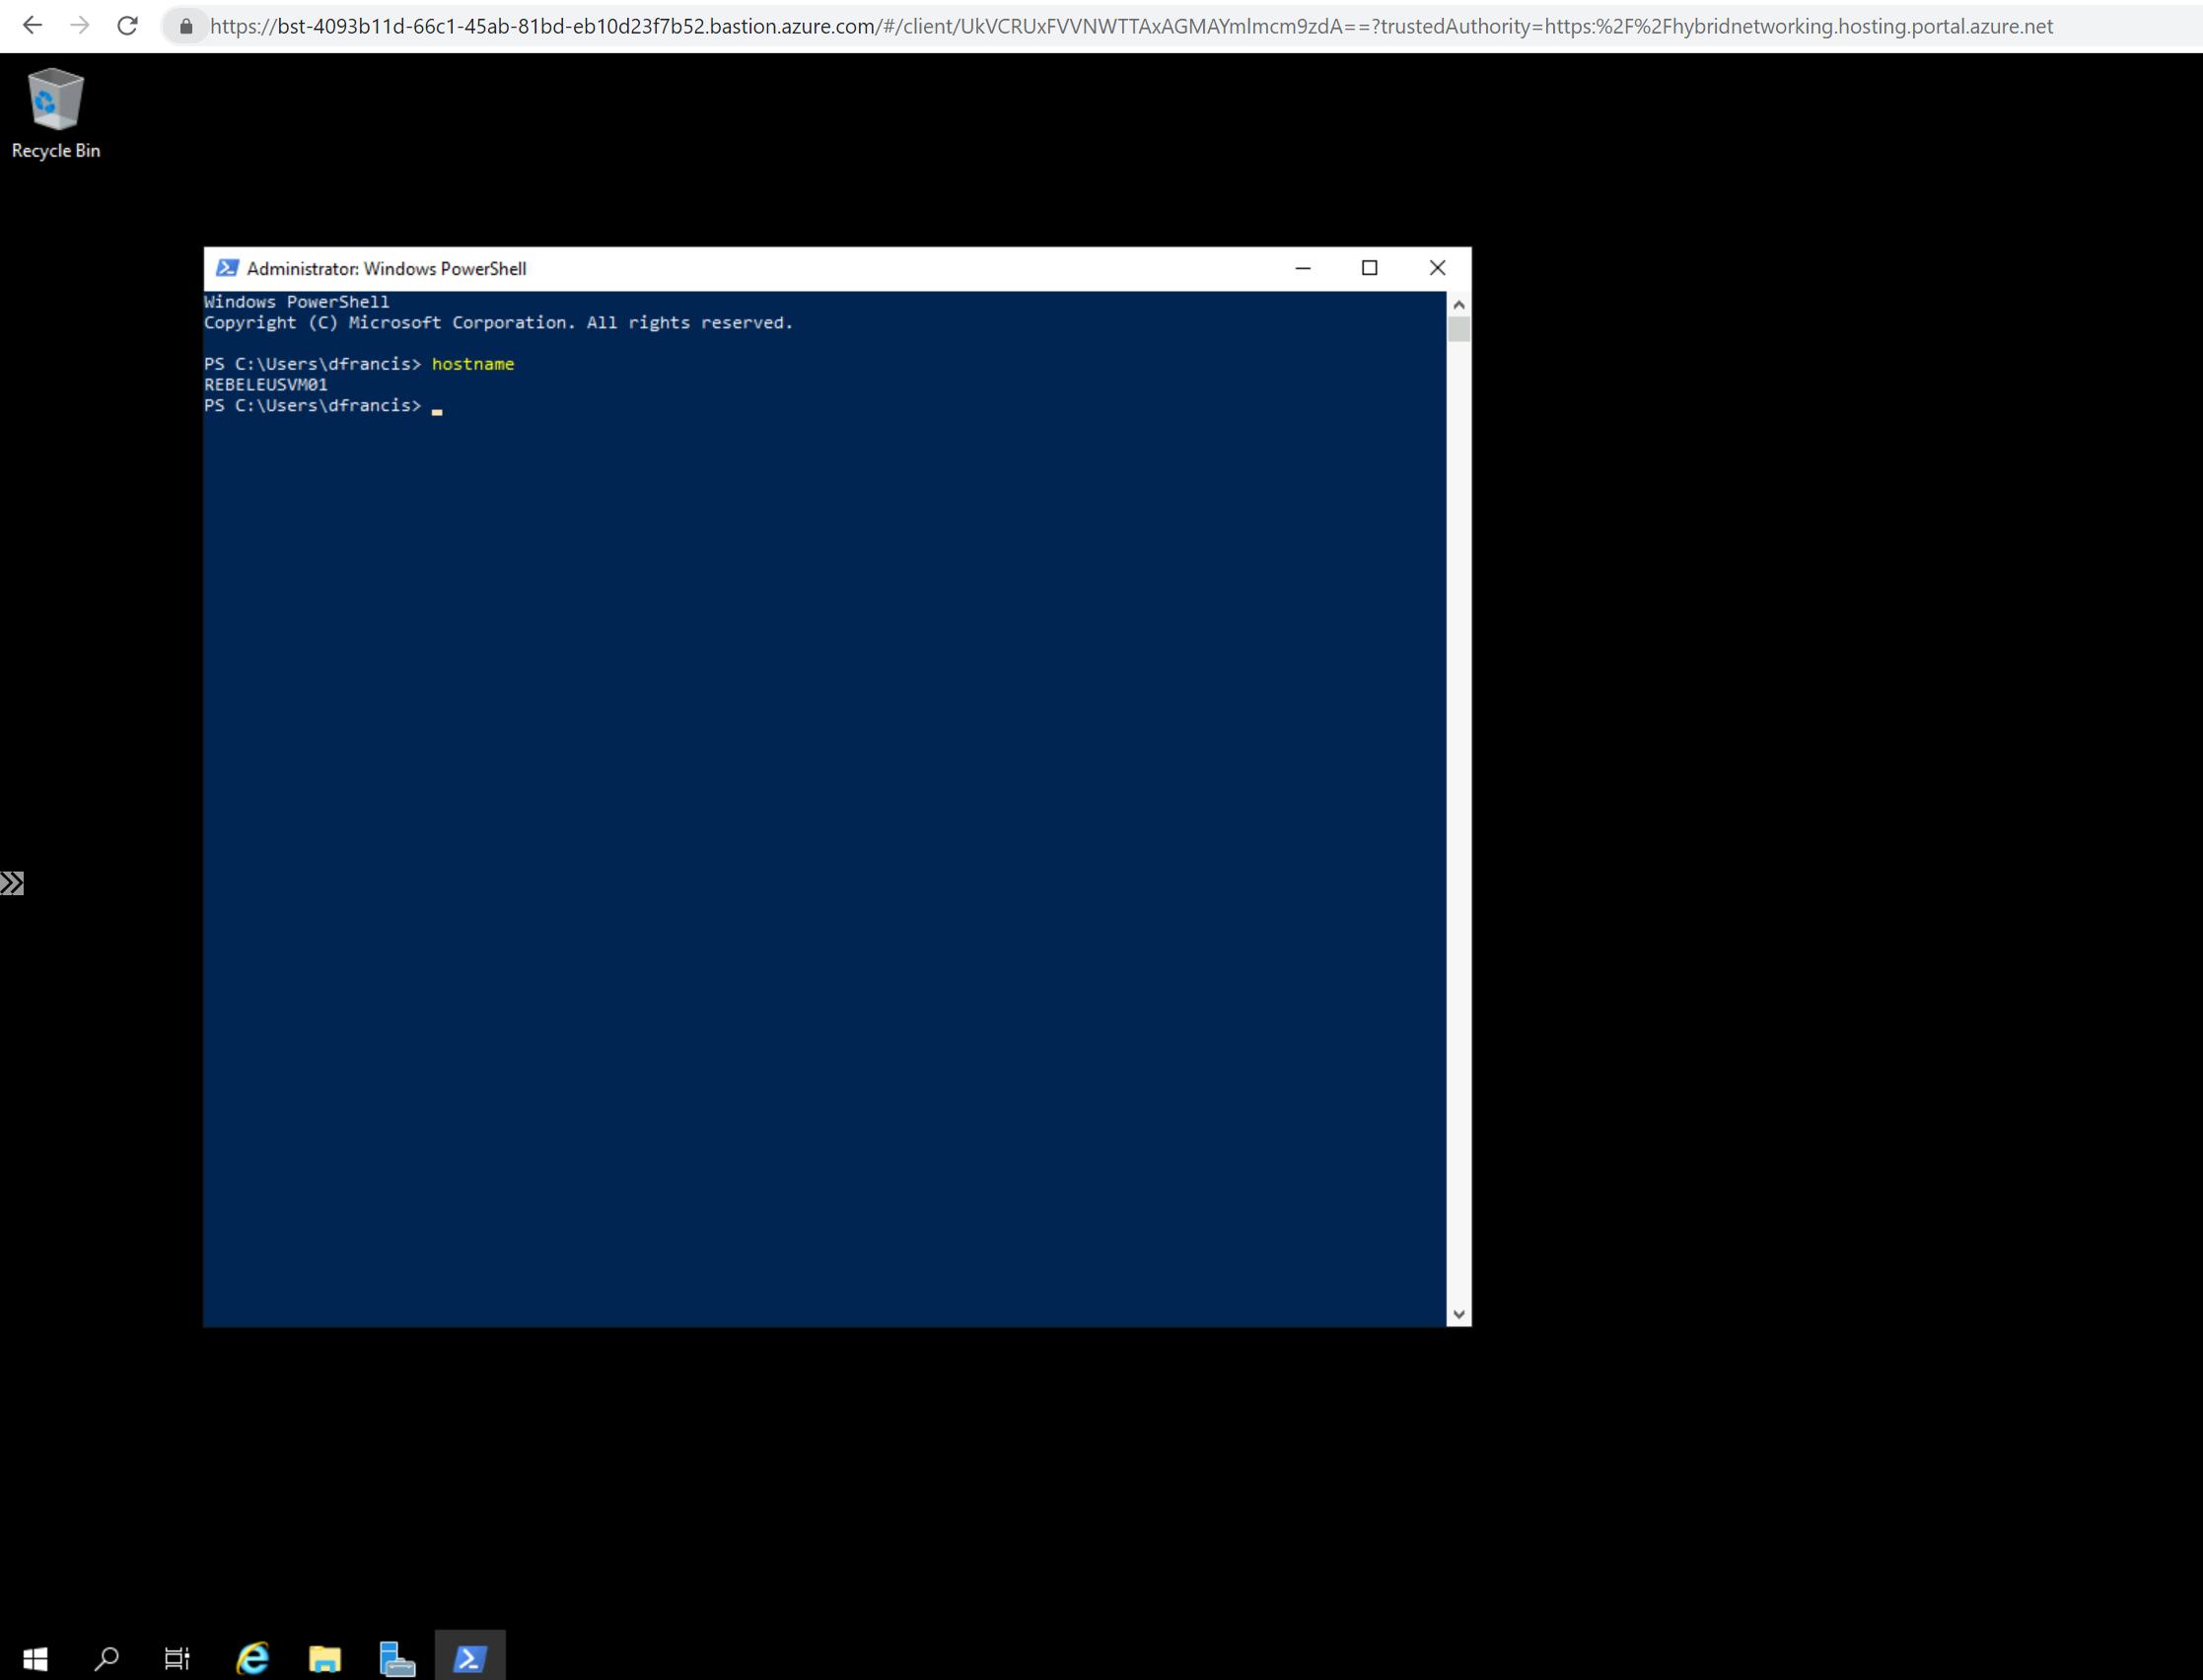 Azure Bastion Connection to Azure VM